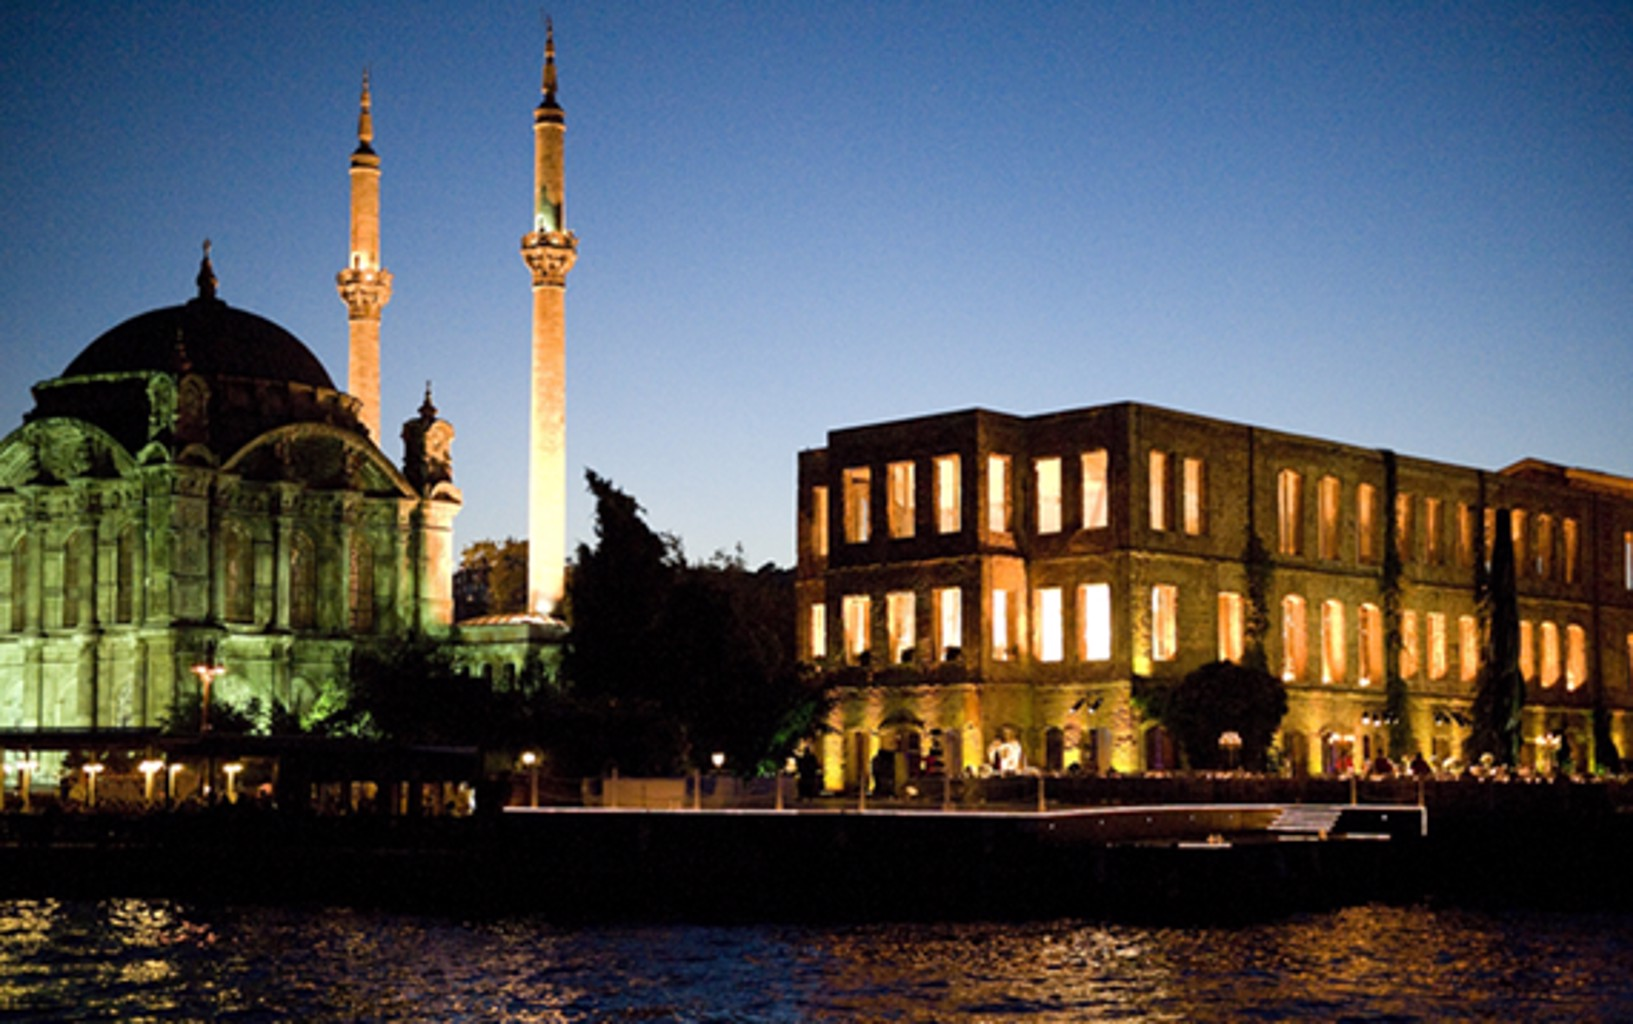 The Marmara Esma Sultan